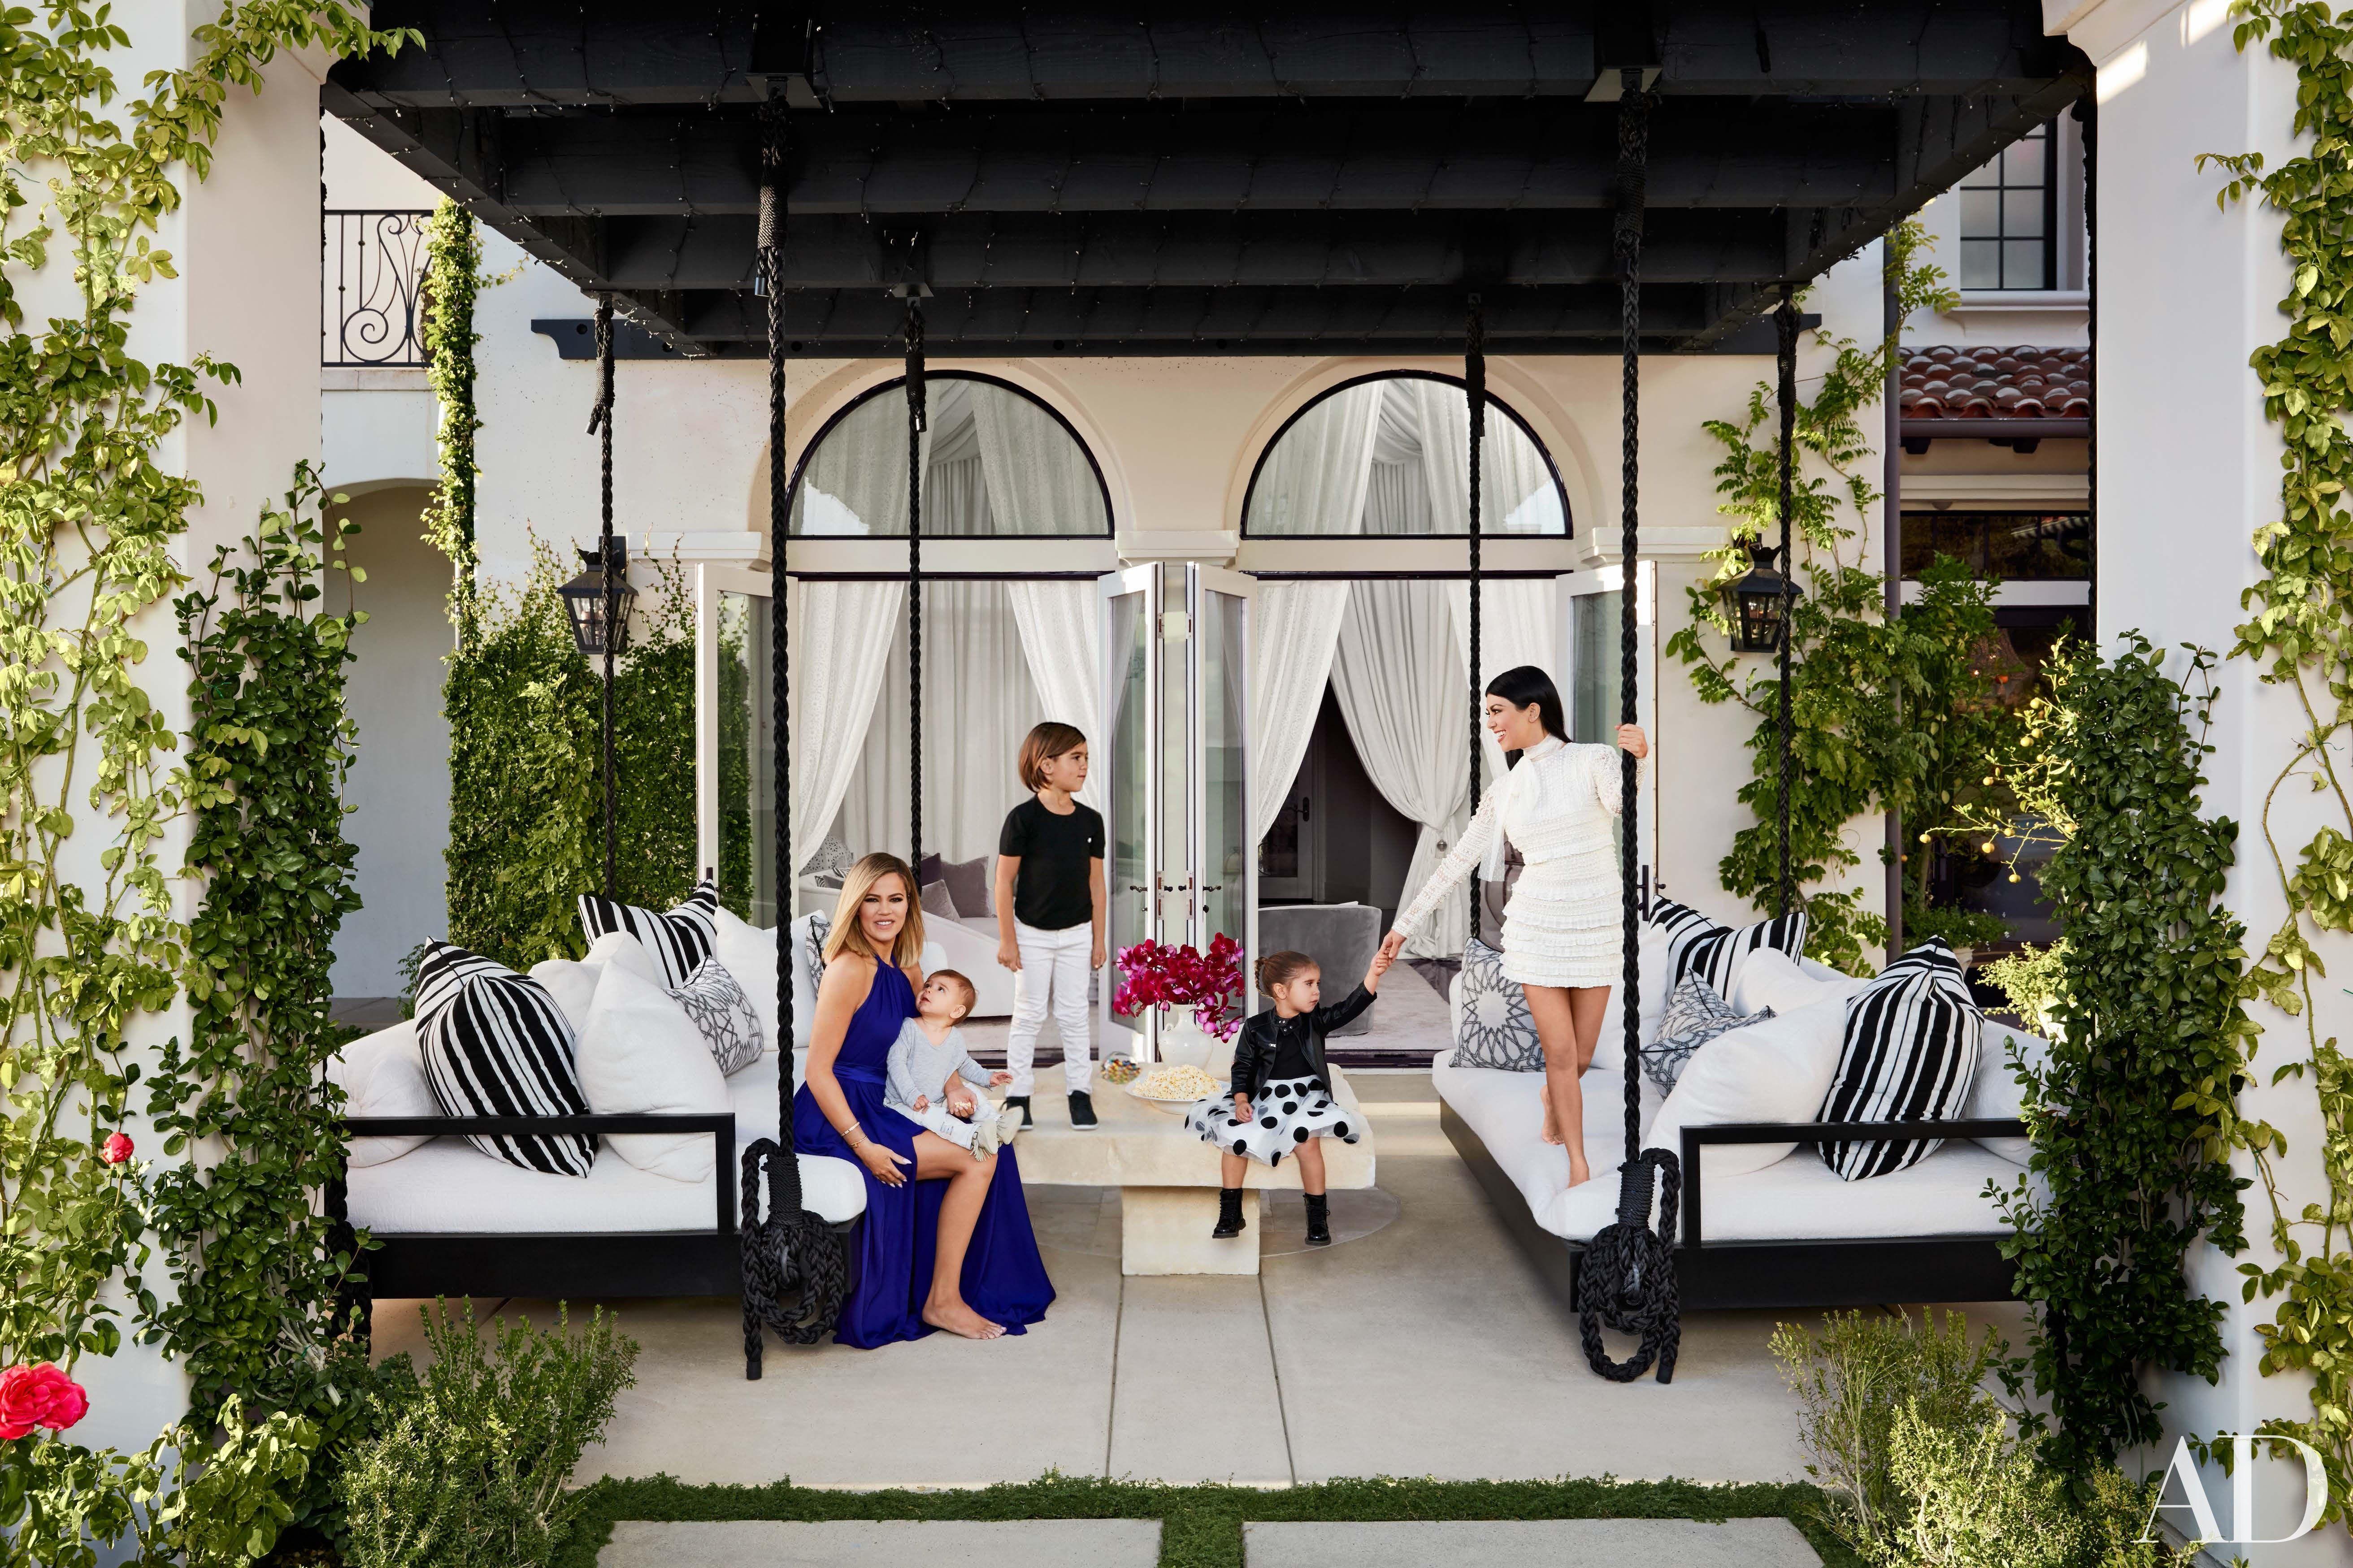 khloé and kourtney kardashian realize their dream homes in